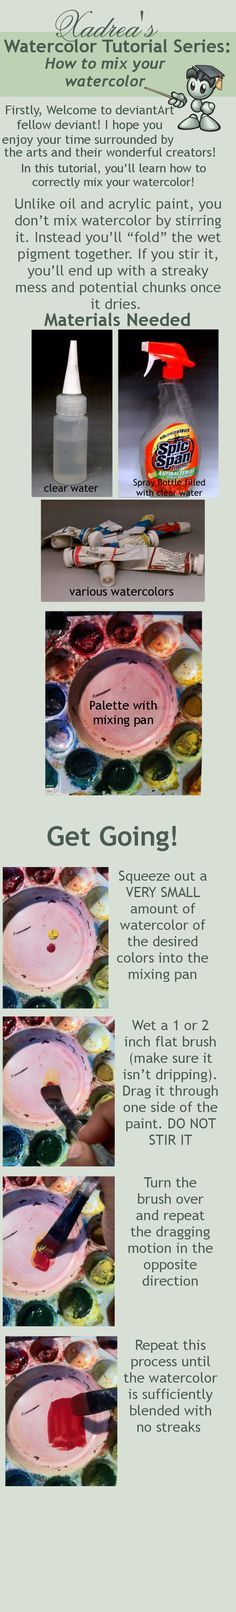 Watercolor Tutorial: How to Mix Watercolor by Xadrea